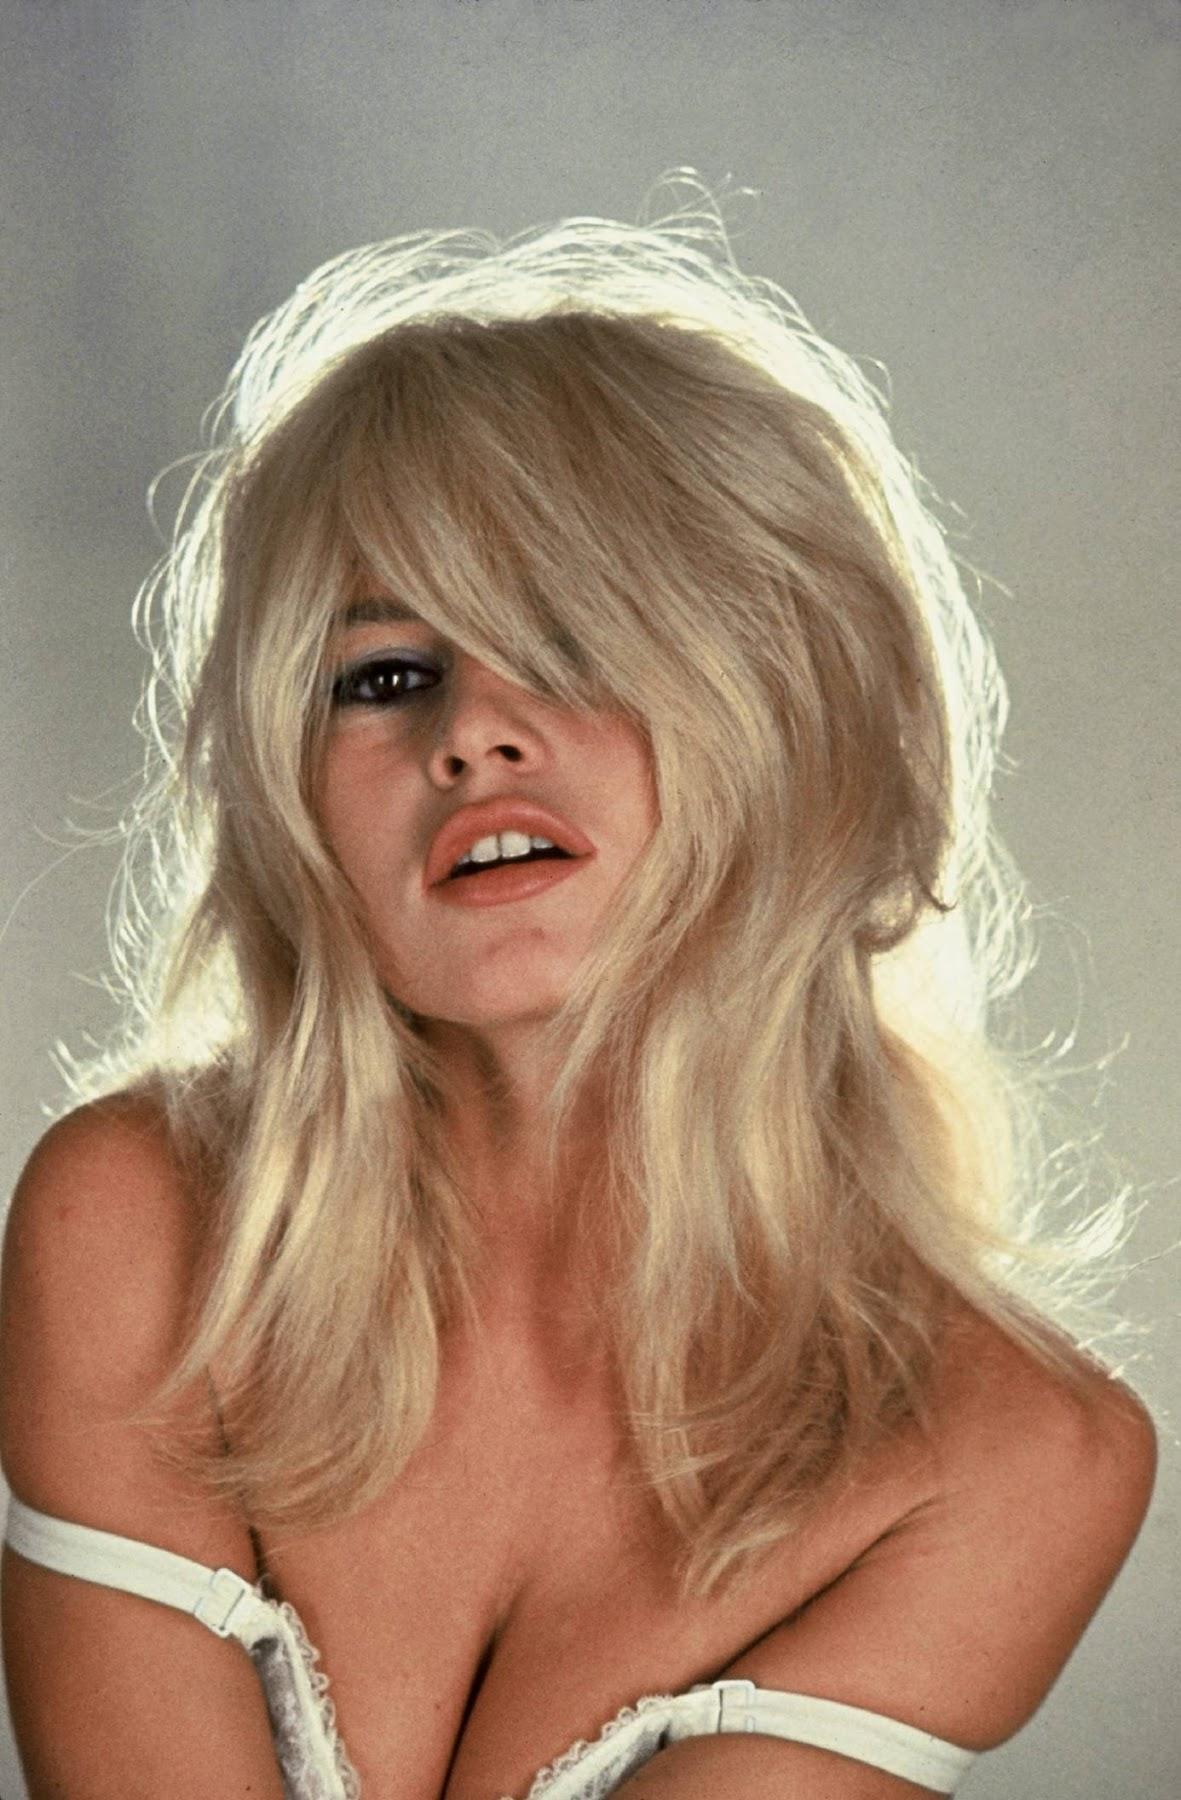 http://1.bp.blogspot.com/-8yvWI1EIWJk/Tc2HNNoShnI/AAAAAAAABao/Jm_OrQZN0YU/s1800/Brigitte+bardot+50.jpg